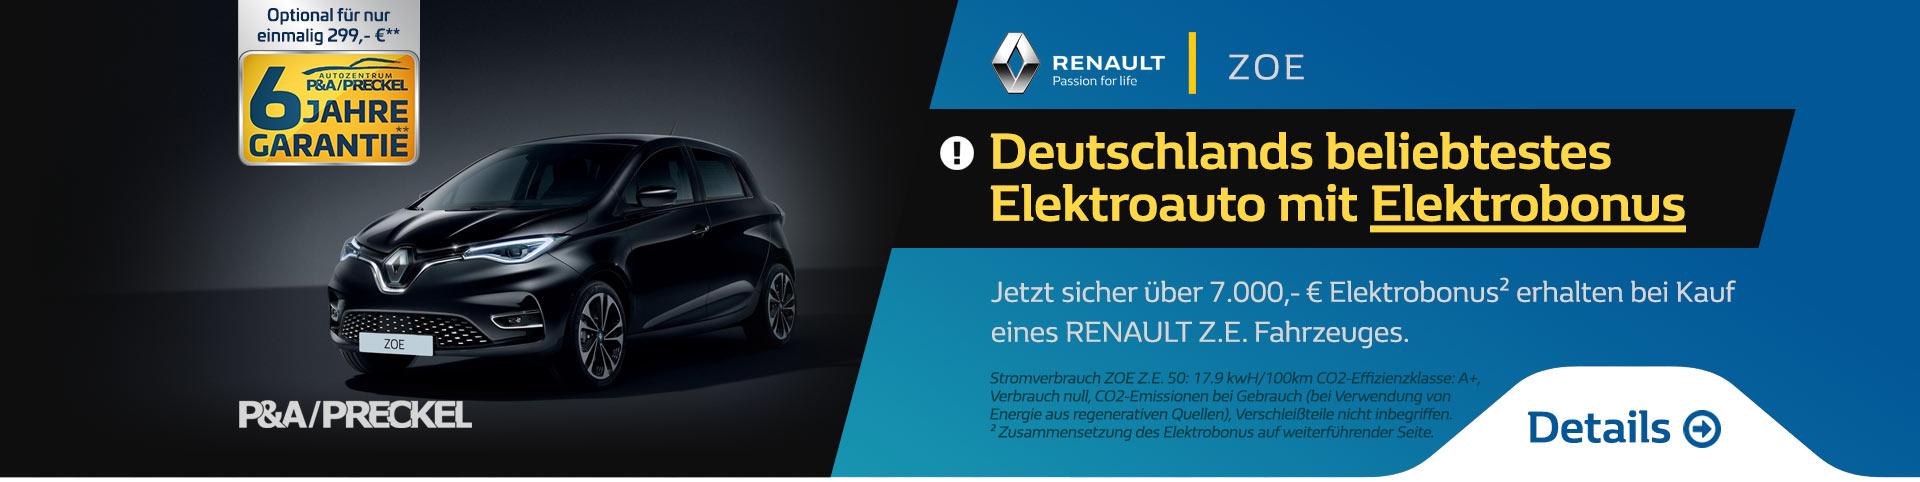 Renault ZOE mit Elektrobonus kaufen